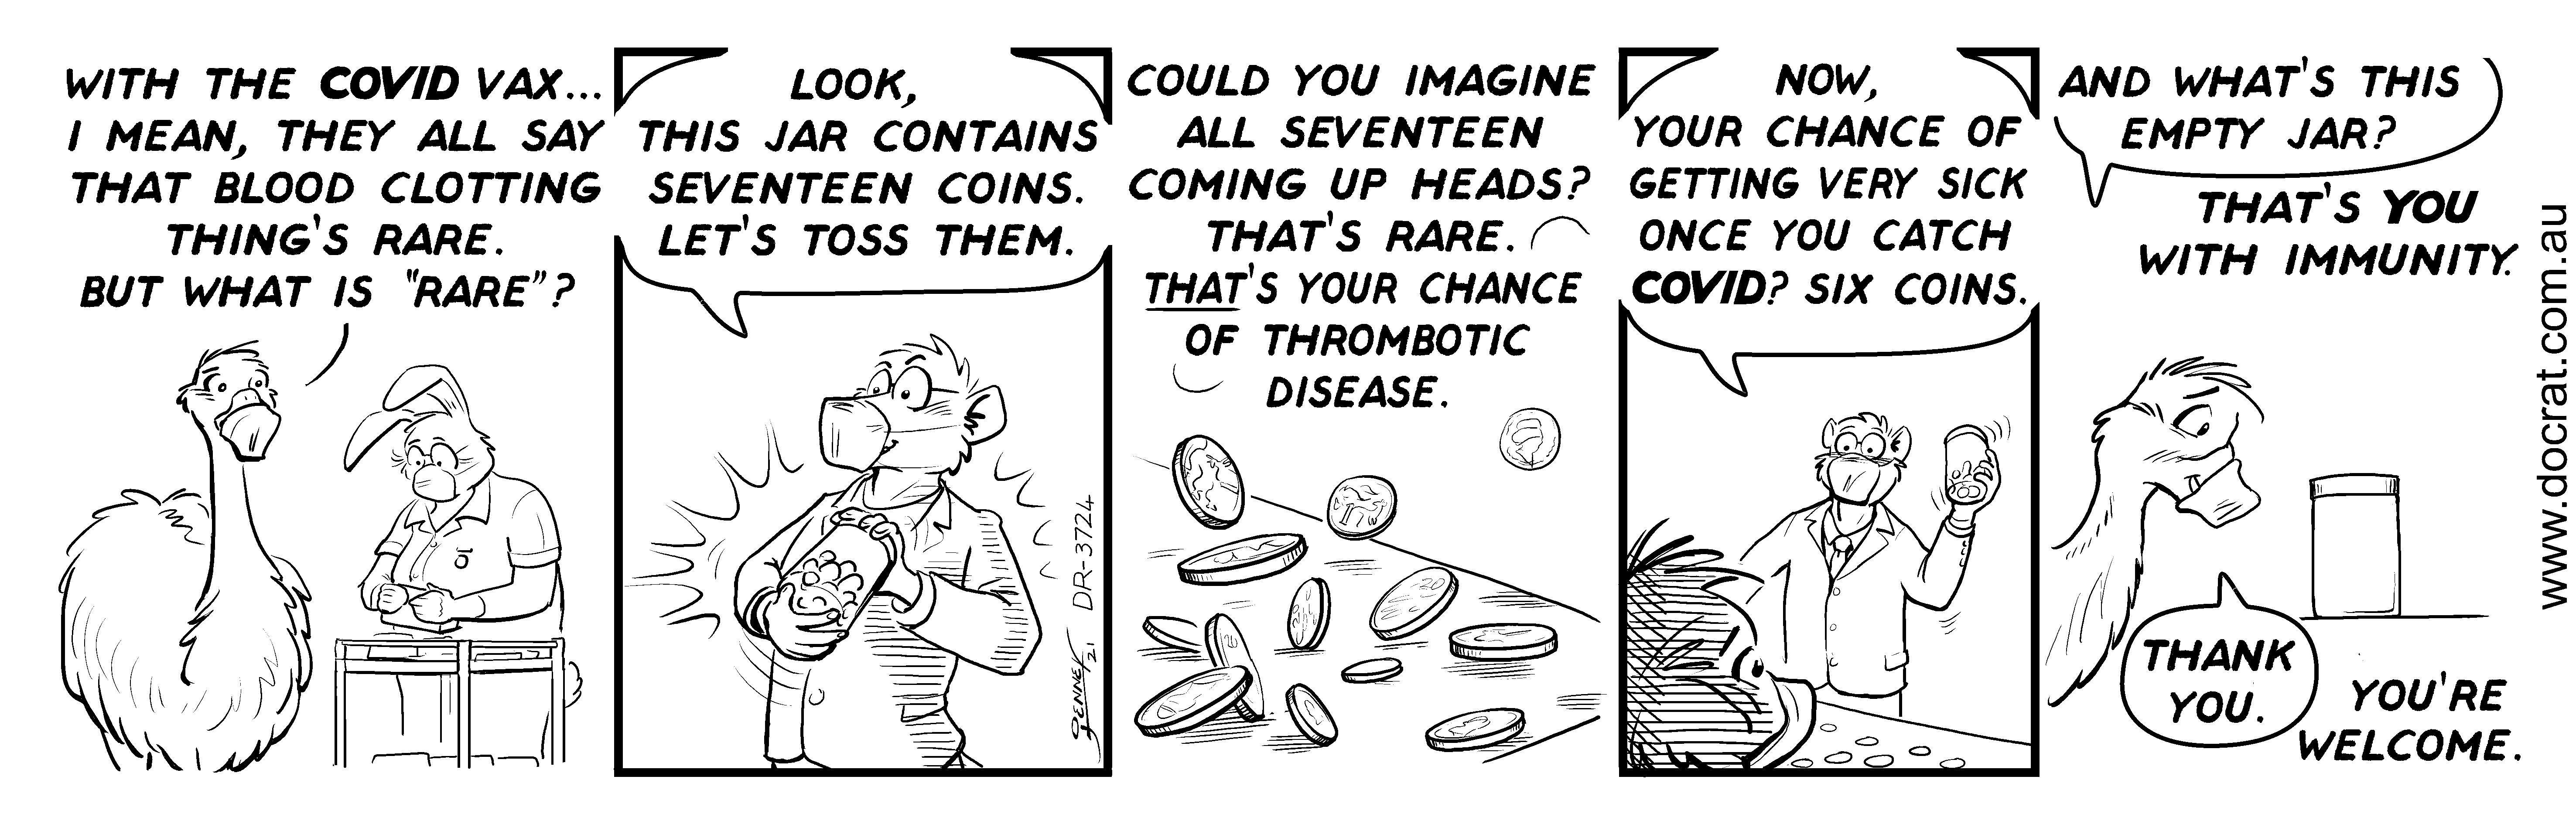 20210422